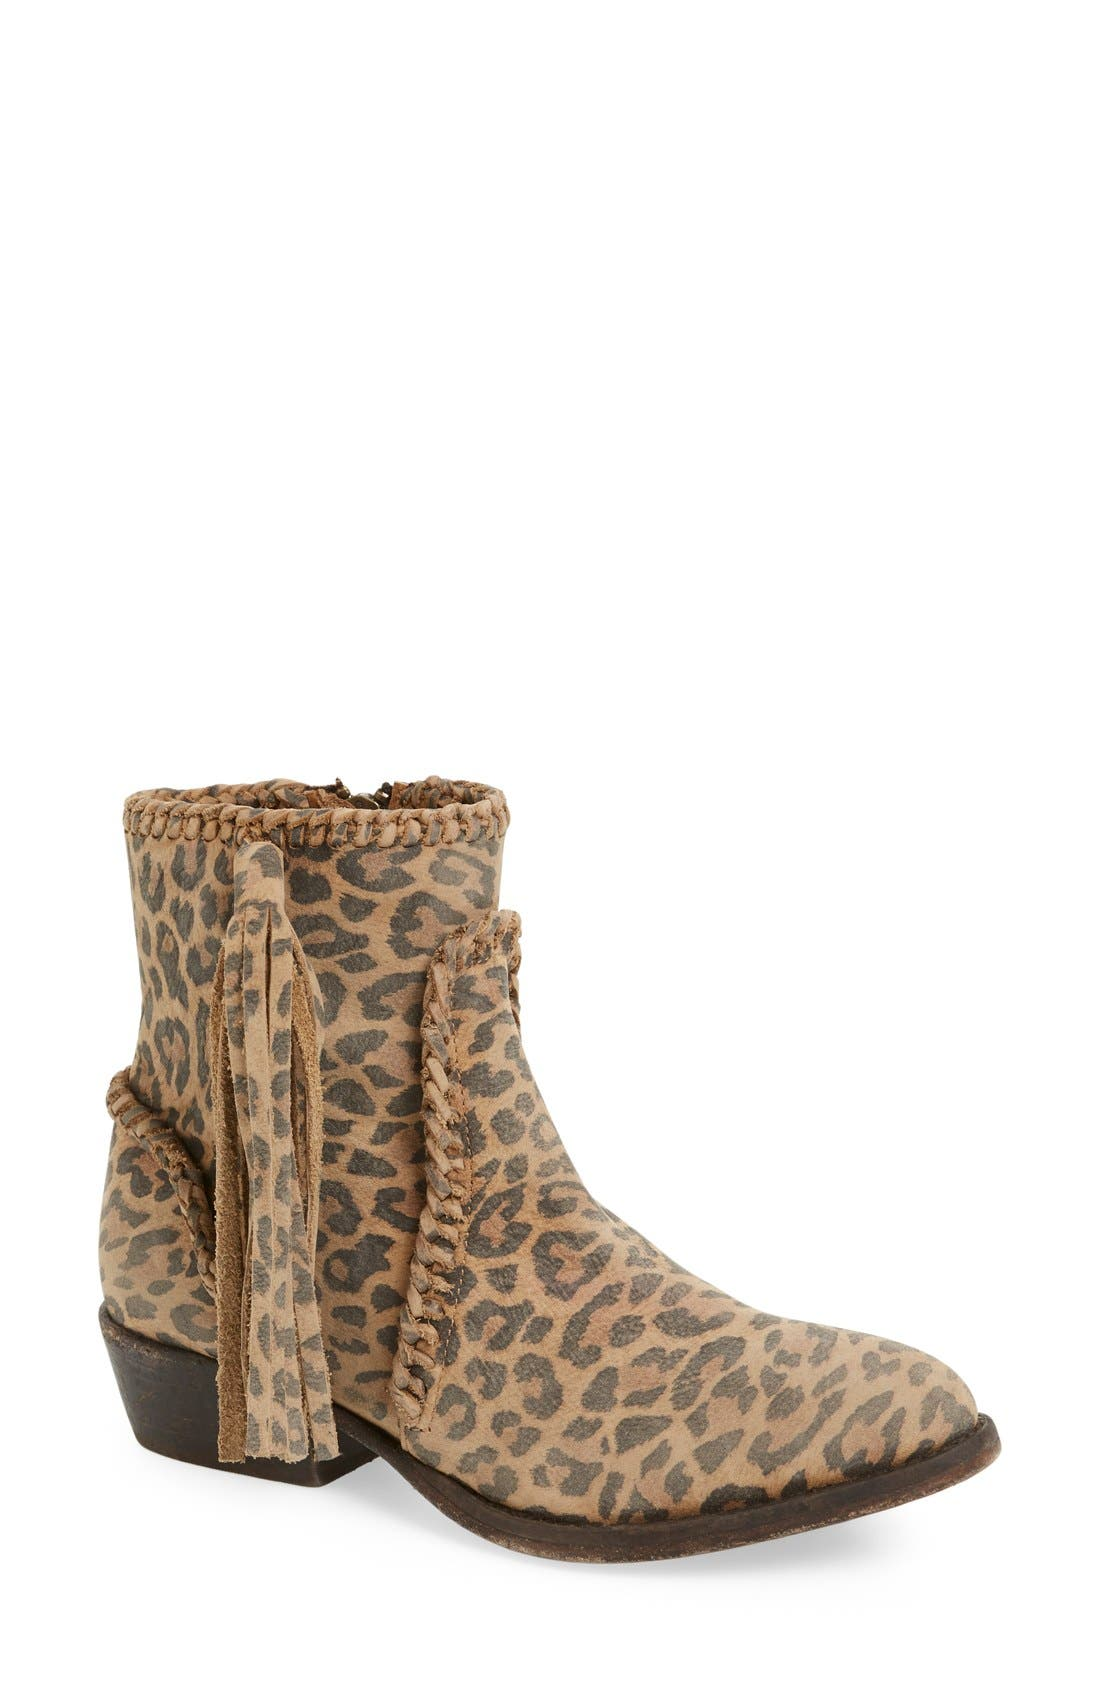 Alternate Image 1 Selected - Matisse 'Sibel' Leopard Print Western Bootie (Women)